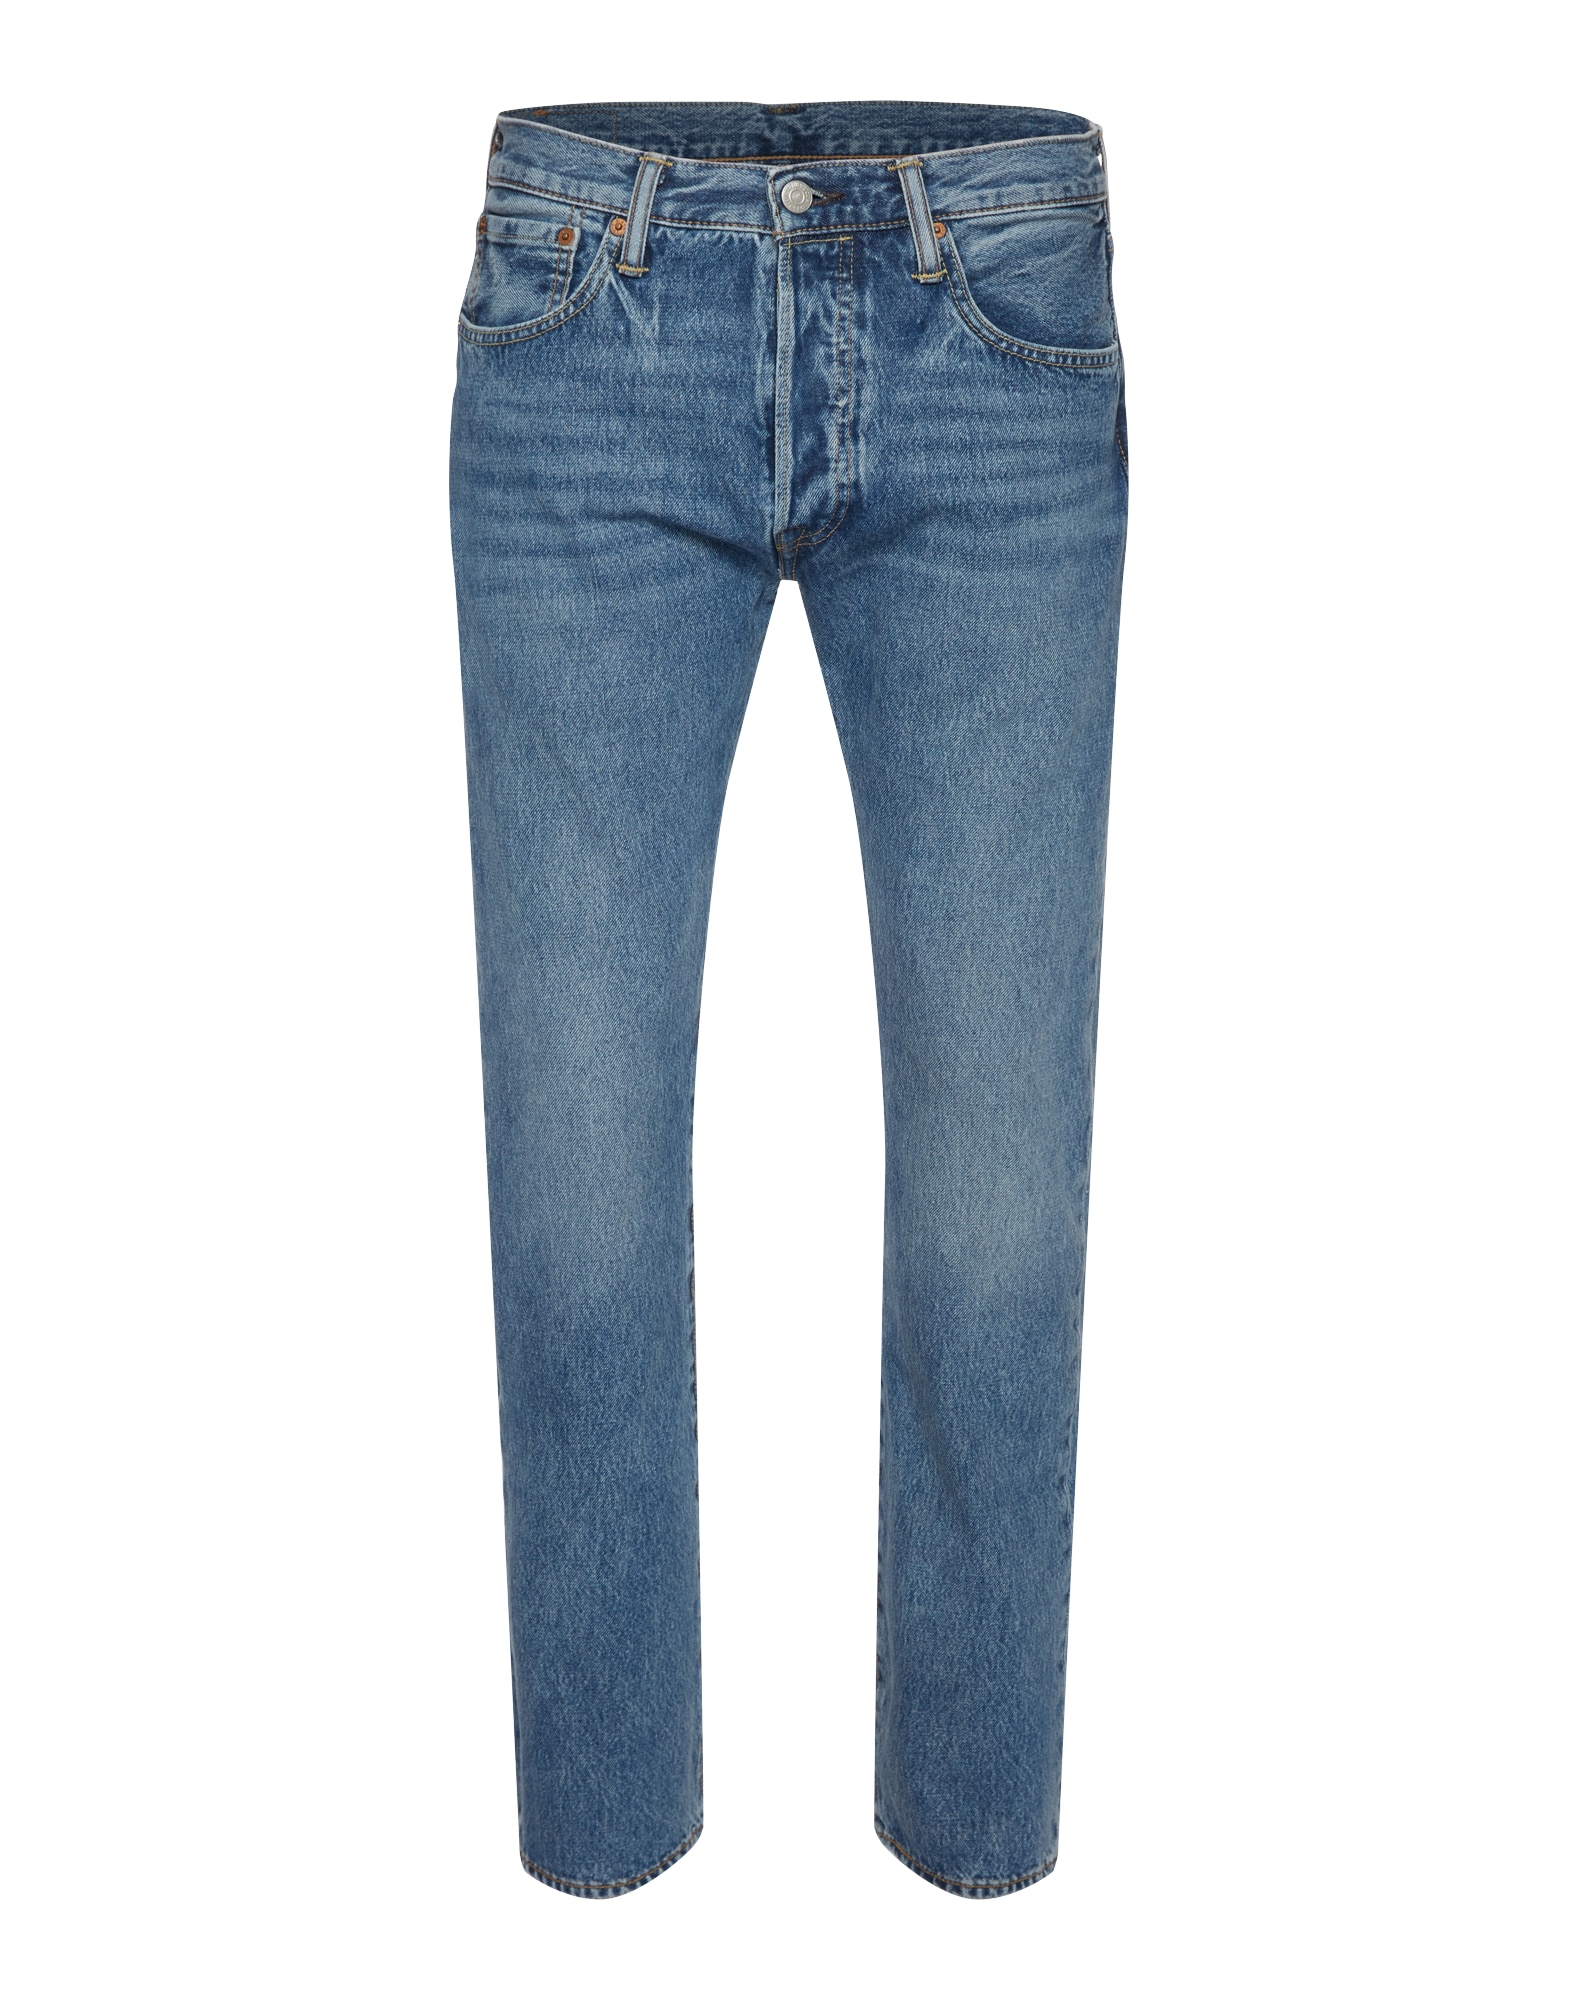 LEVI'S Heren Jeans 501 ORIGINAL FIT blue denim